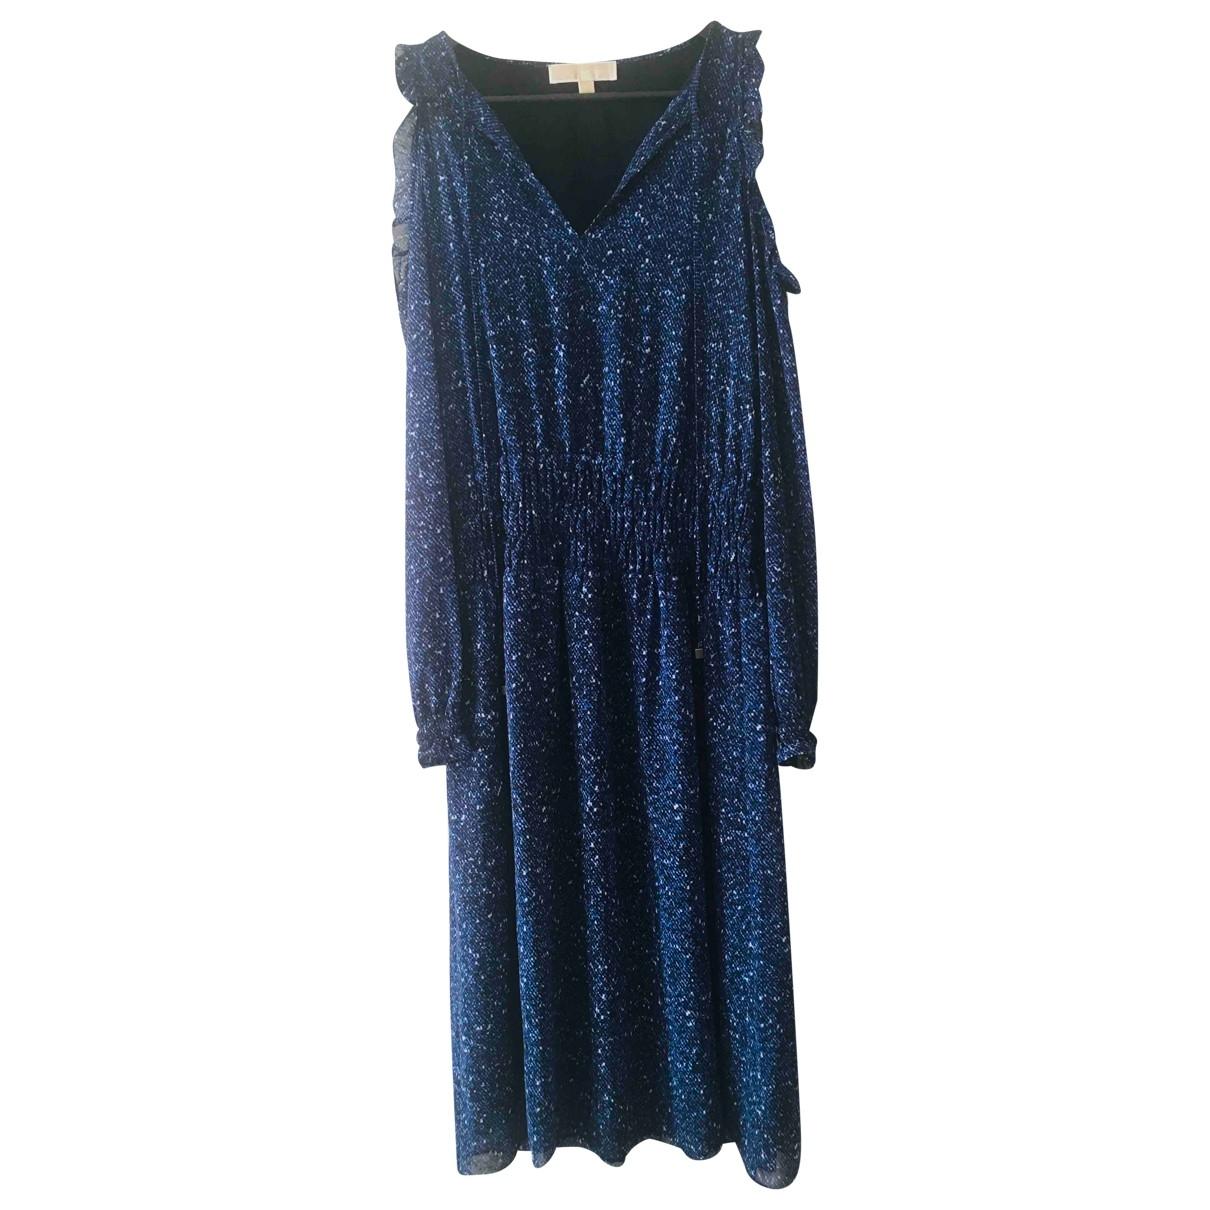 Michael Kors \N Kleid in  Blau Mit Pailletten